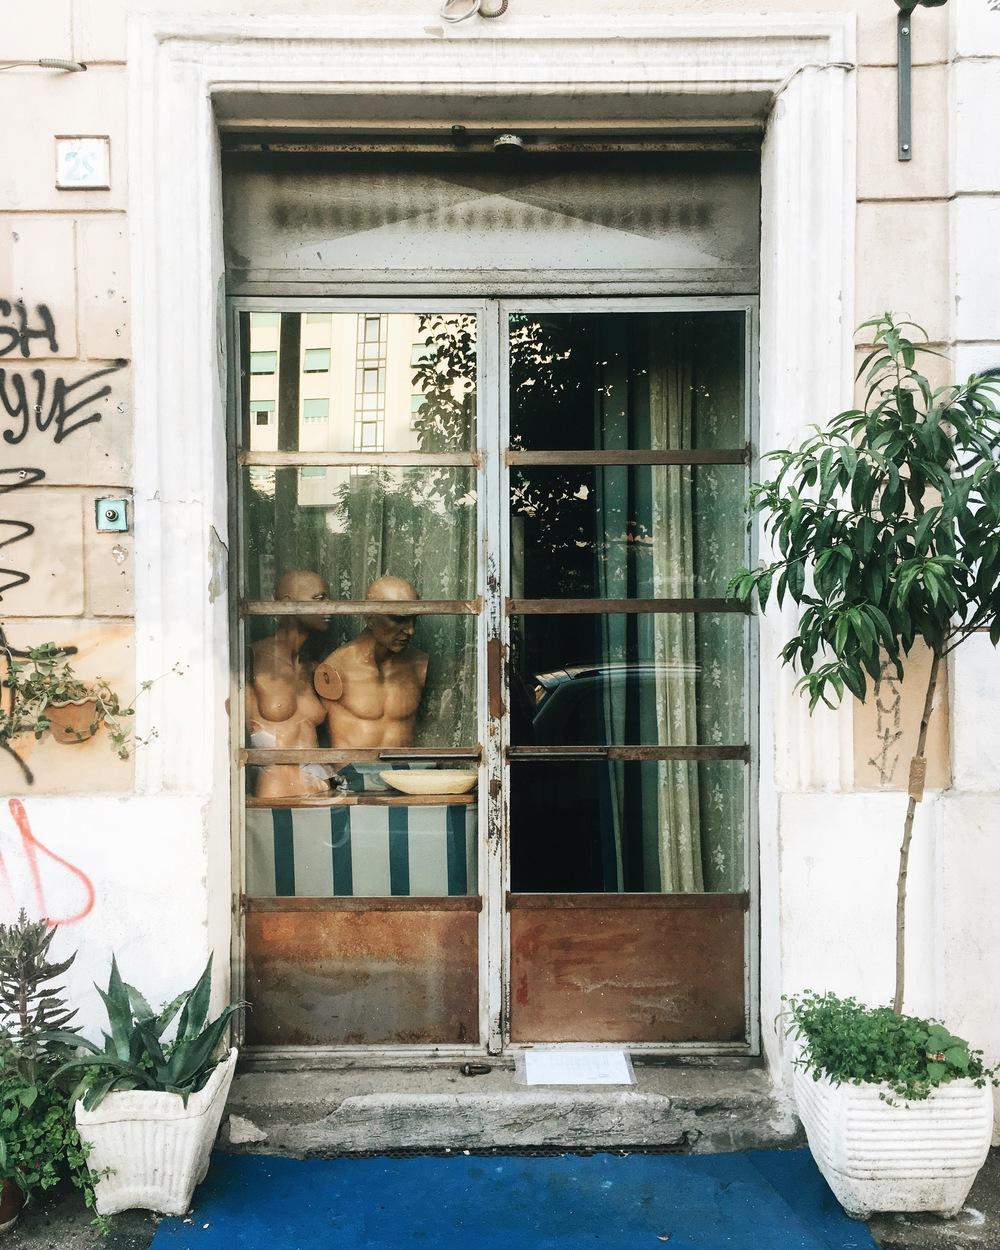 Rome_2016_helena melikov_2.jpeg